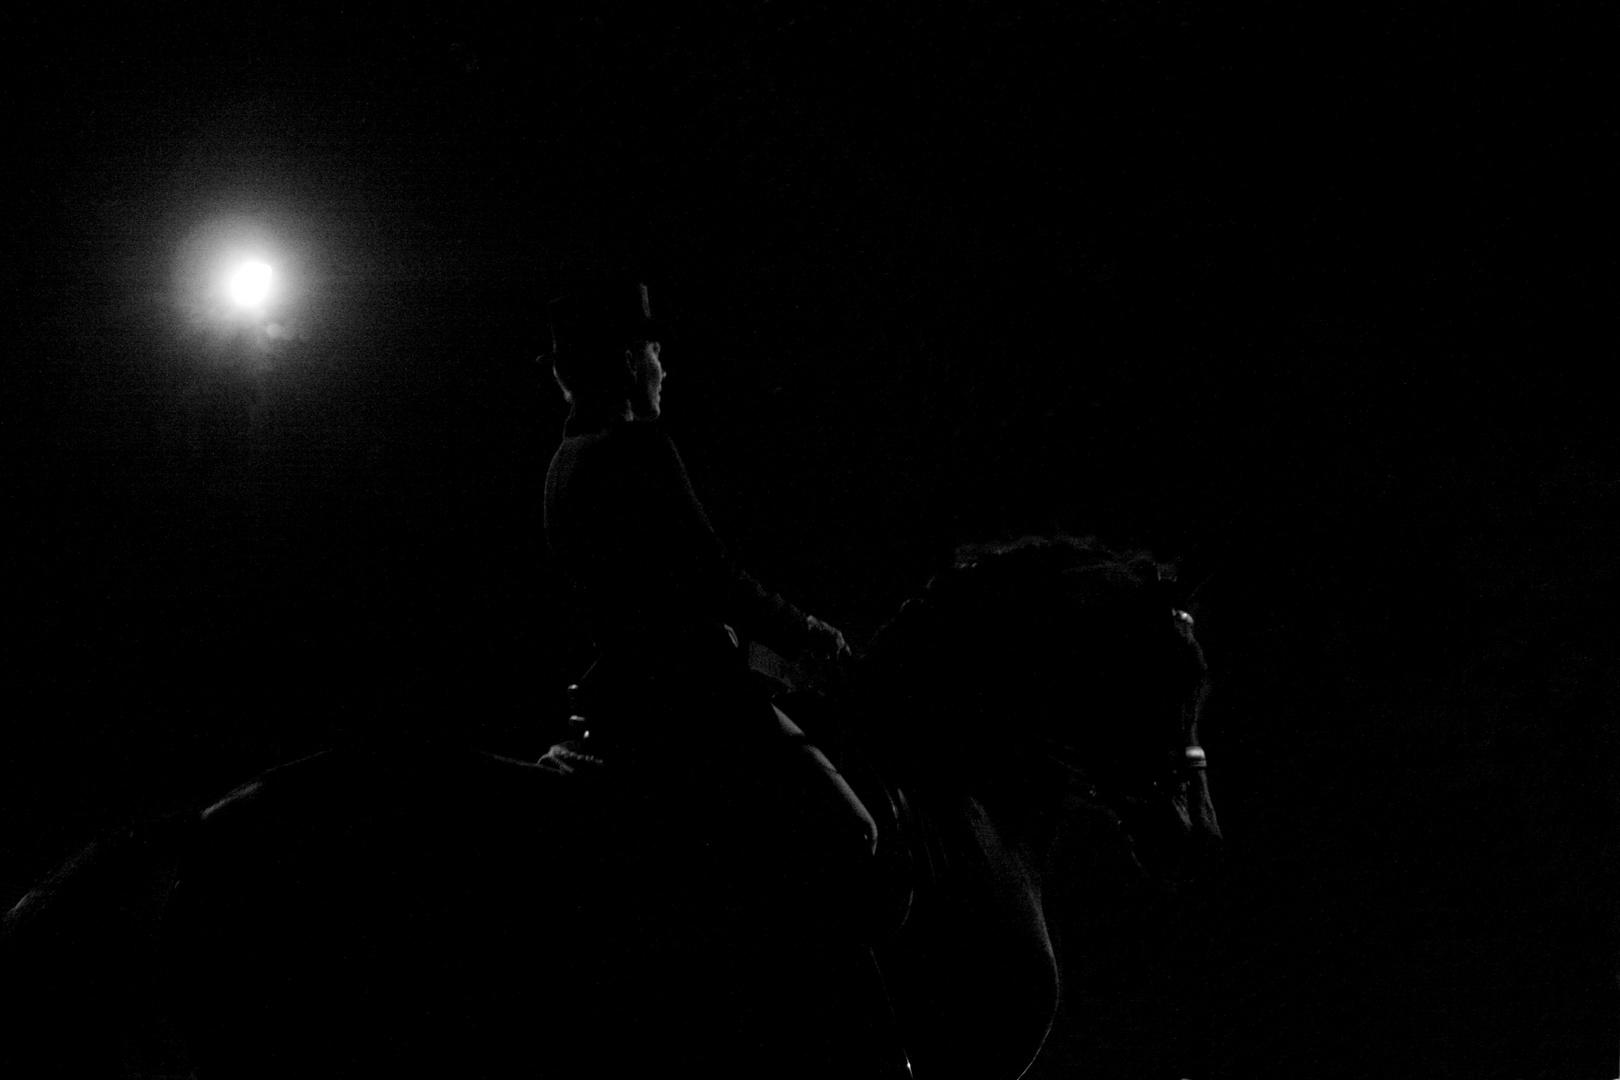 black beauty in the night